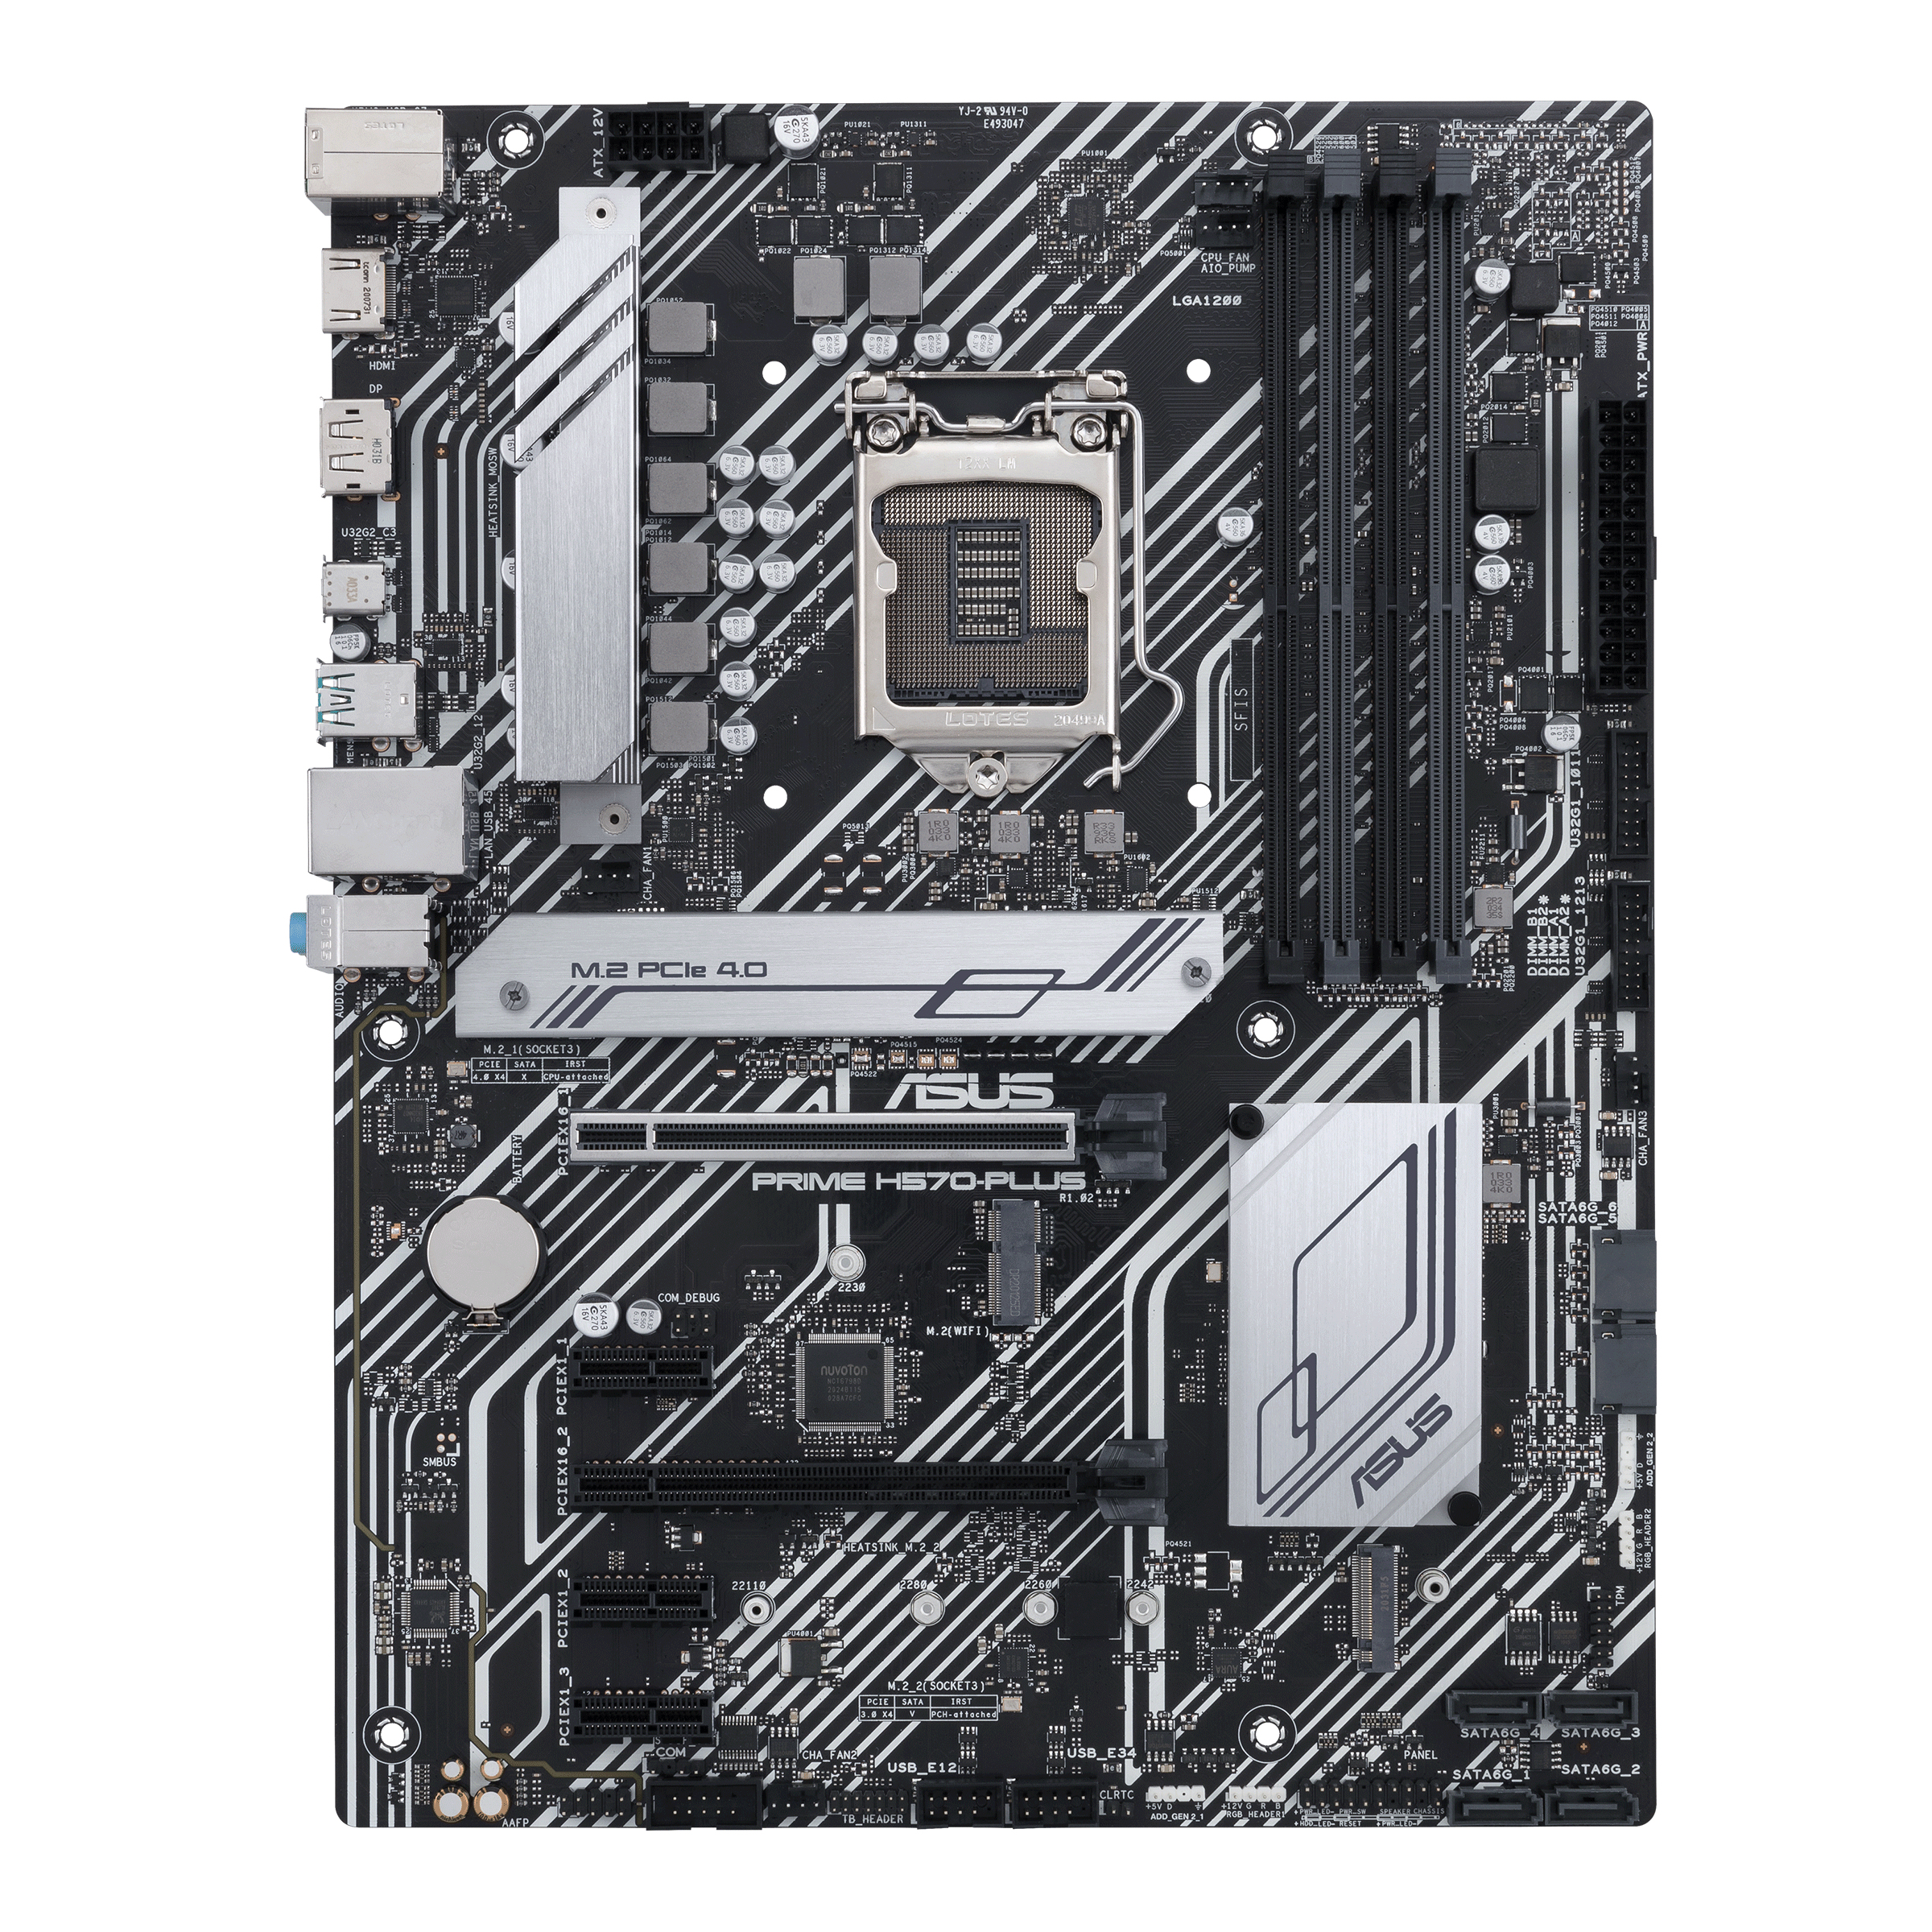 ASUS PRIME H570-PLUS - Motherboard - ATX - LGA1200-Sockel - H570 - USB-C Gen2, USB 3.2 Gen 1, USB 3.2 Gen 2 - Gigabit LAN - Onboard-Grafik (CPU erforderlich)